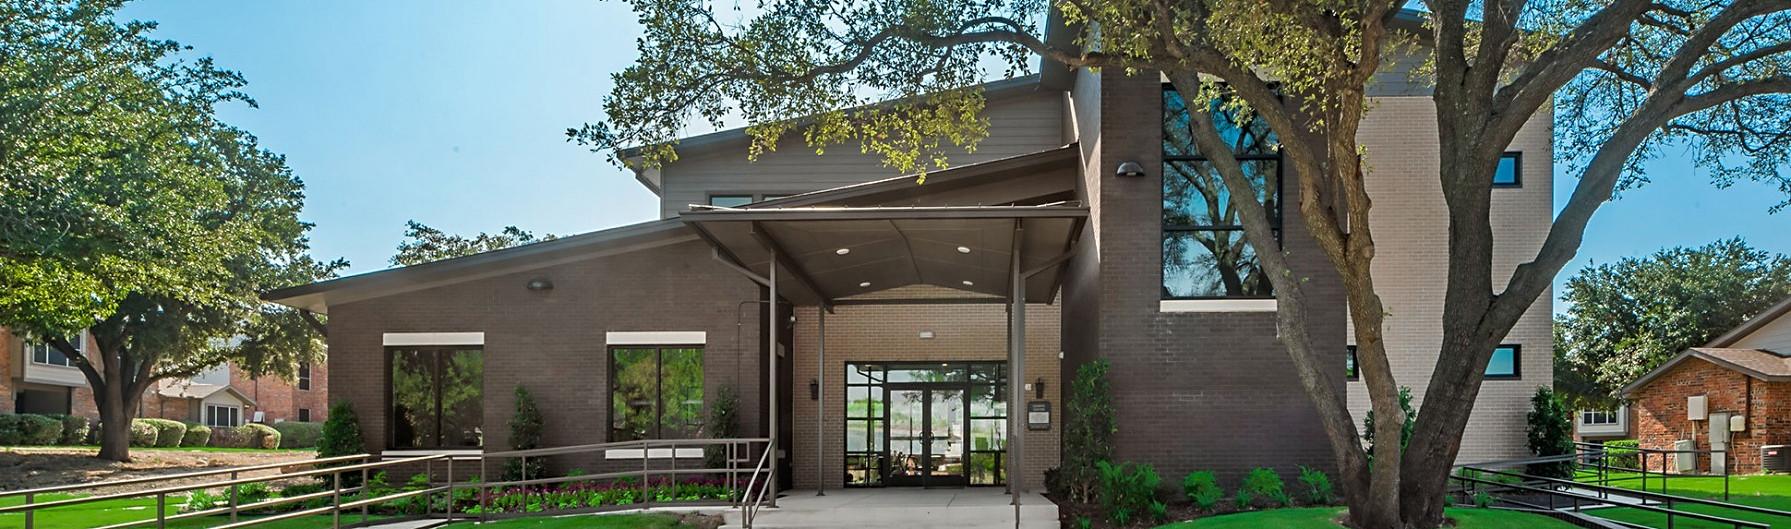 Clubhouse, Carrolton, TX